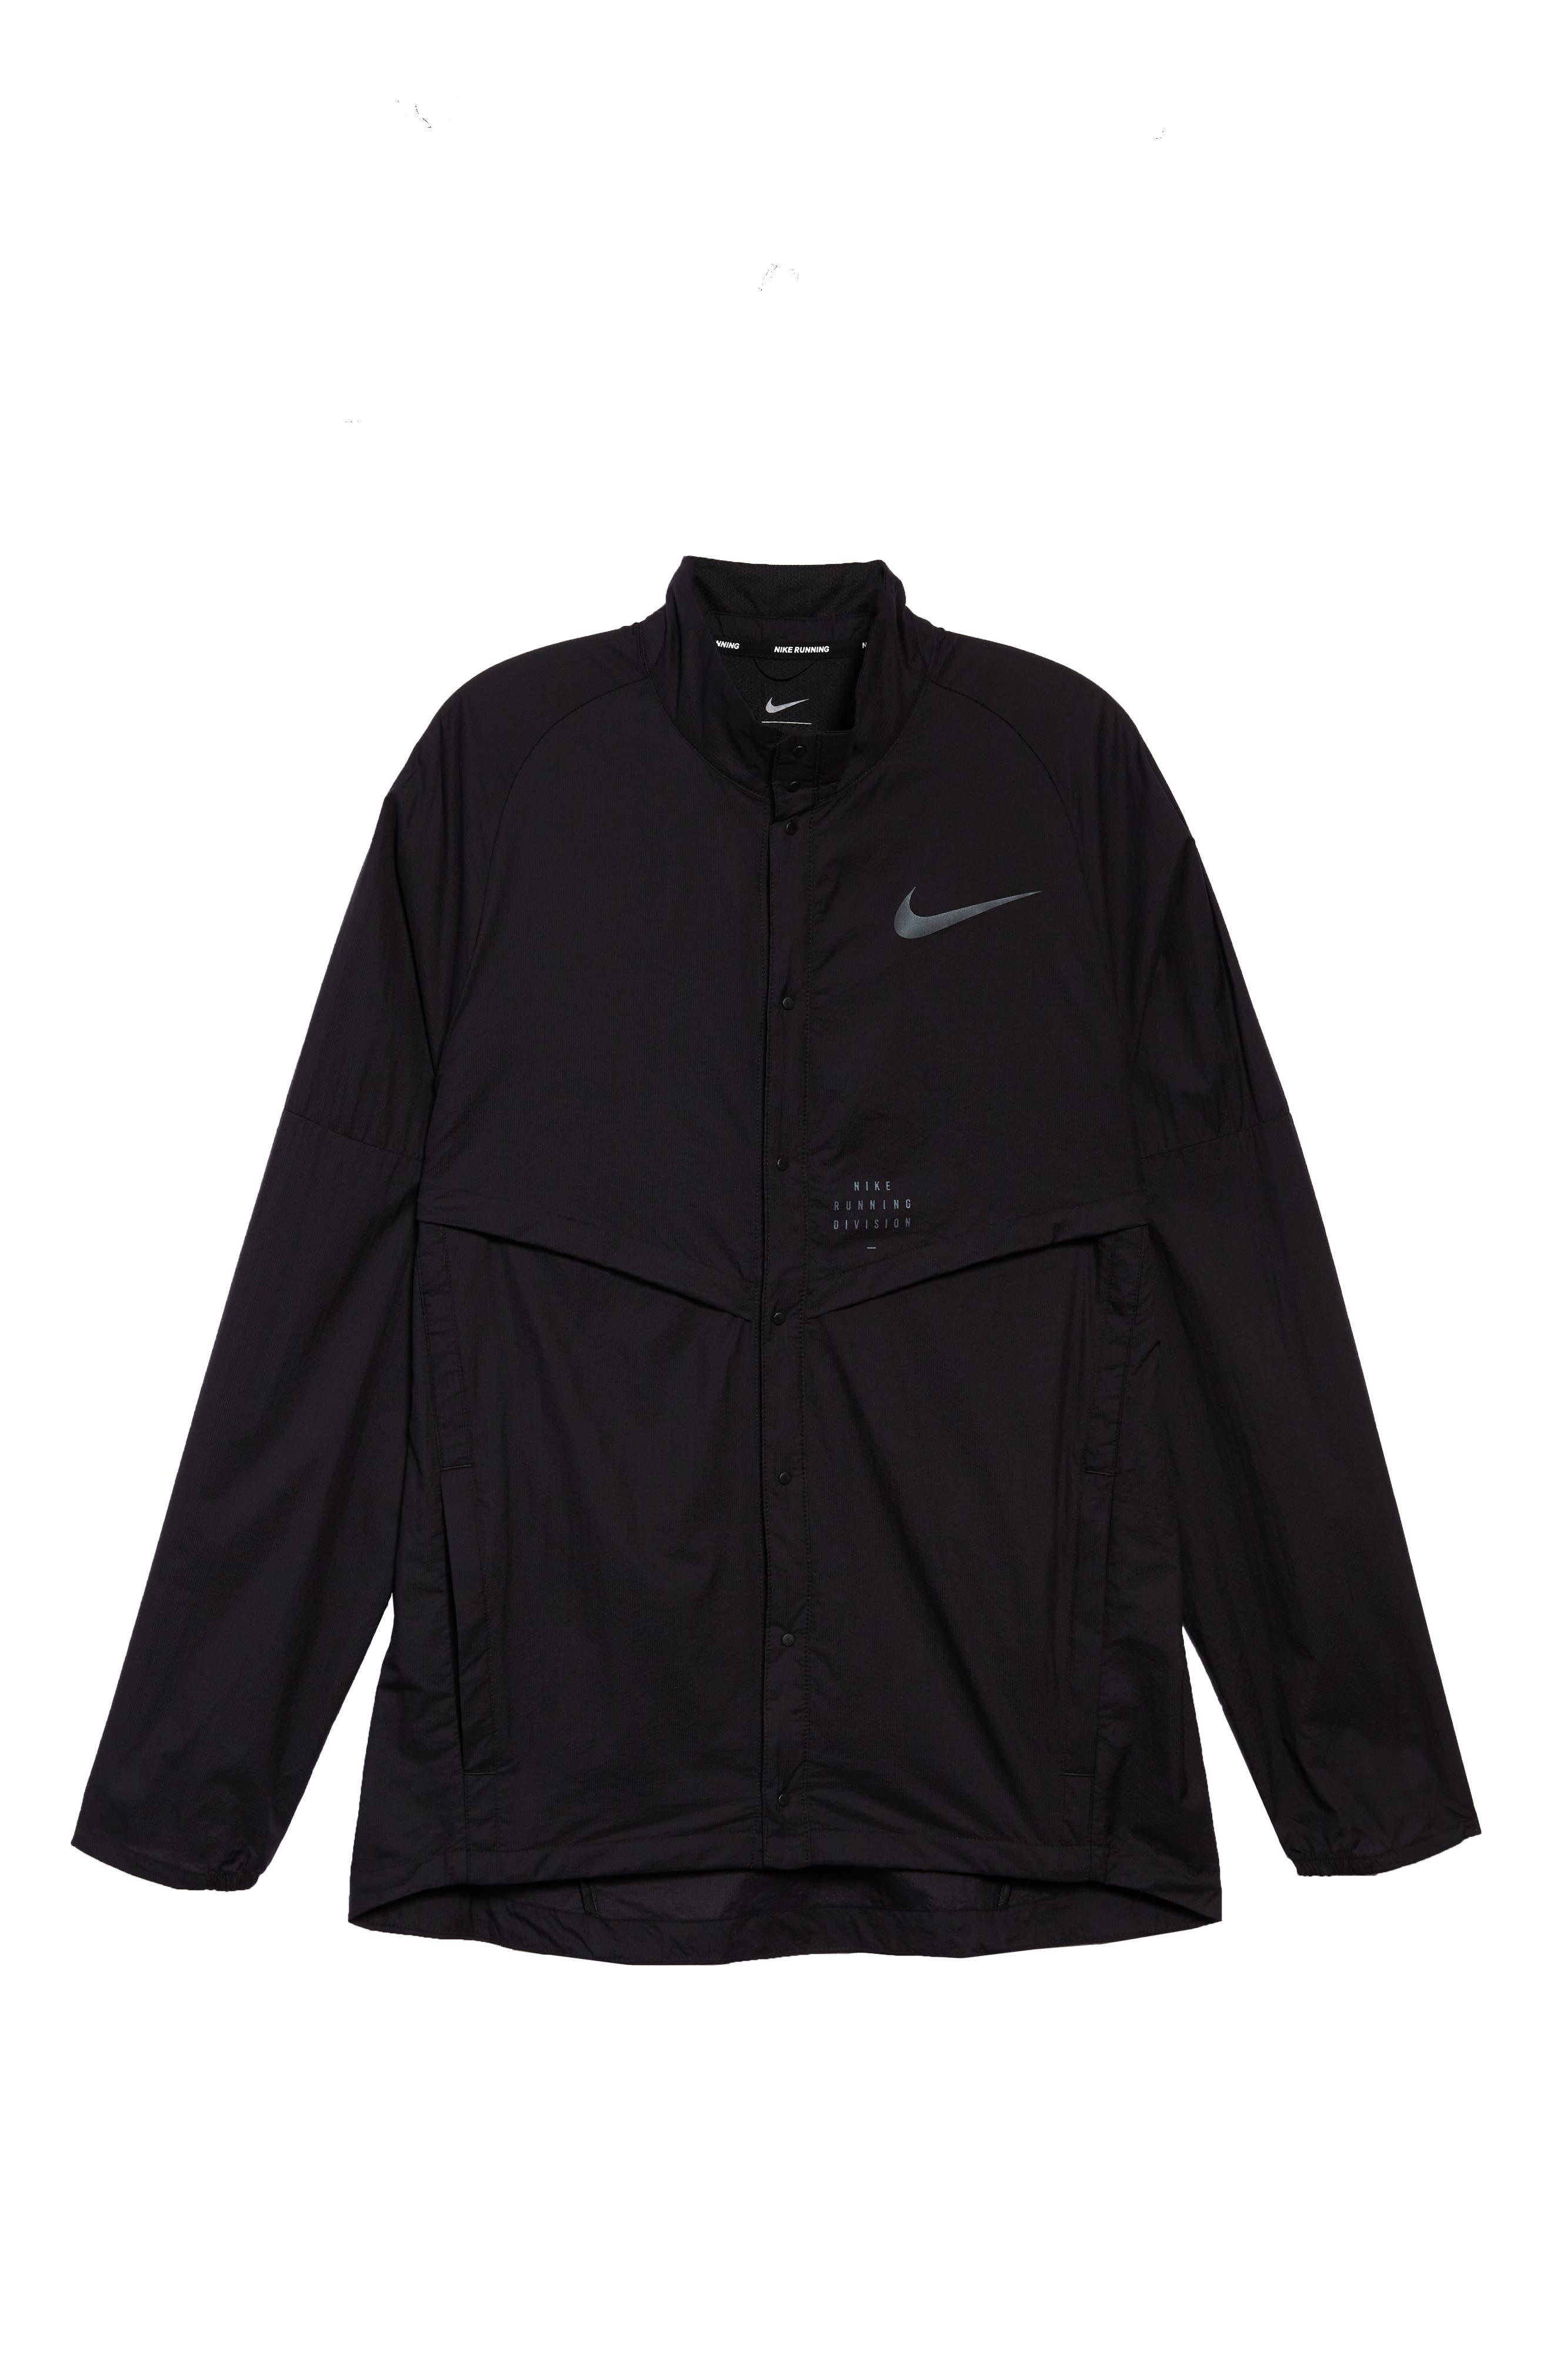 Run Division Jacket,                             Alternate thumbnail 6, color,                             BLACK